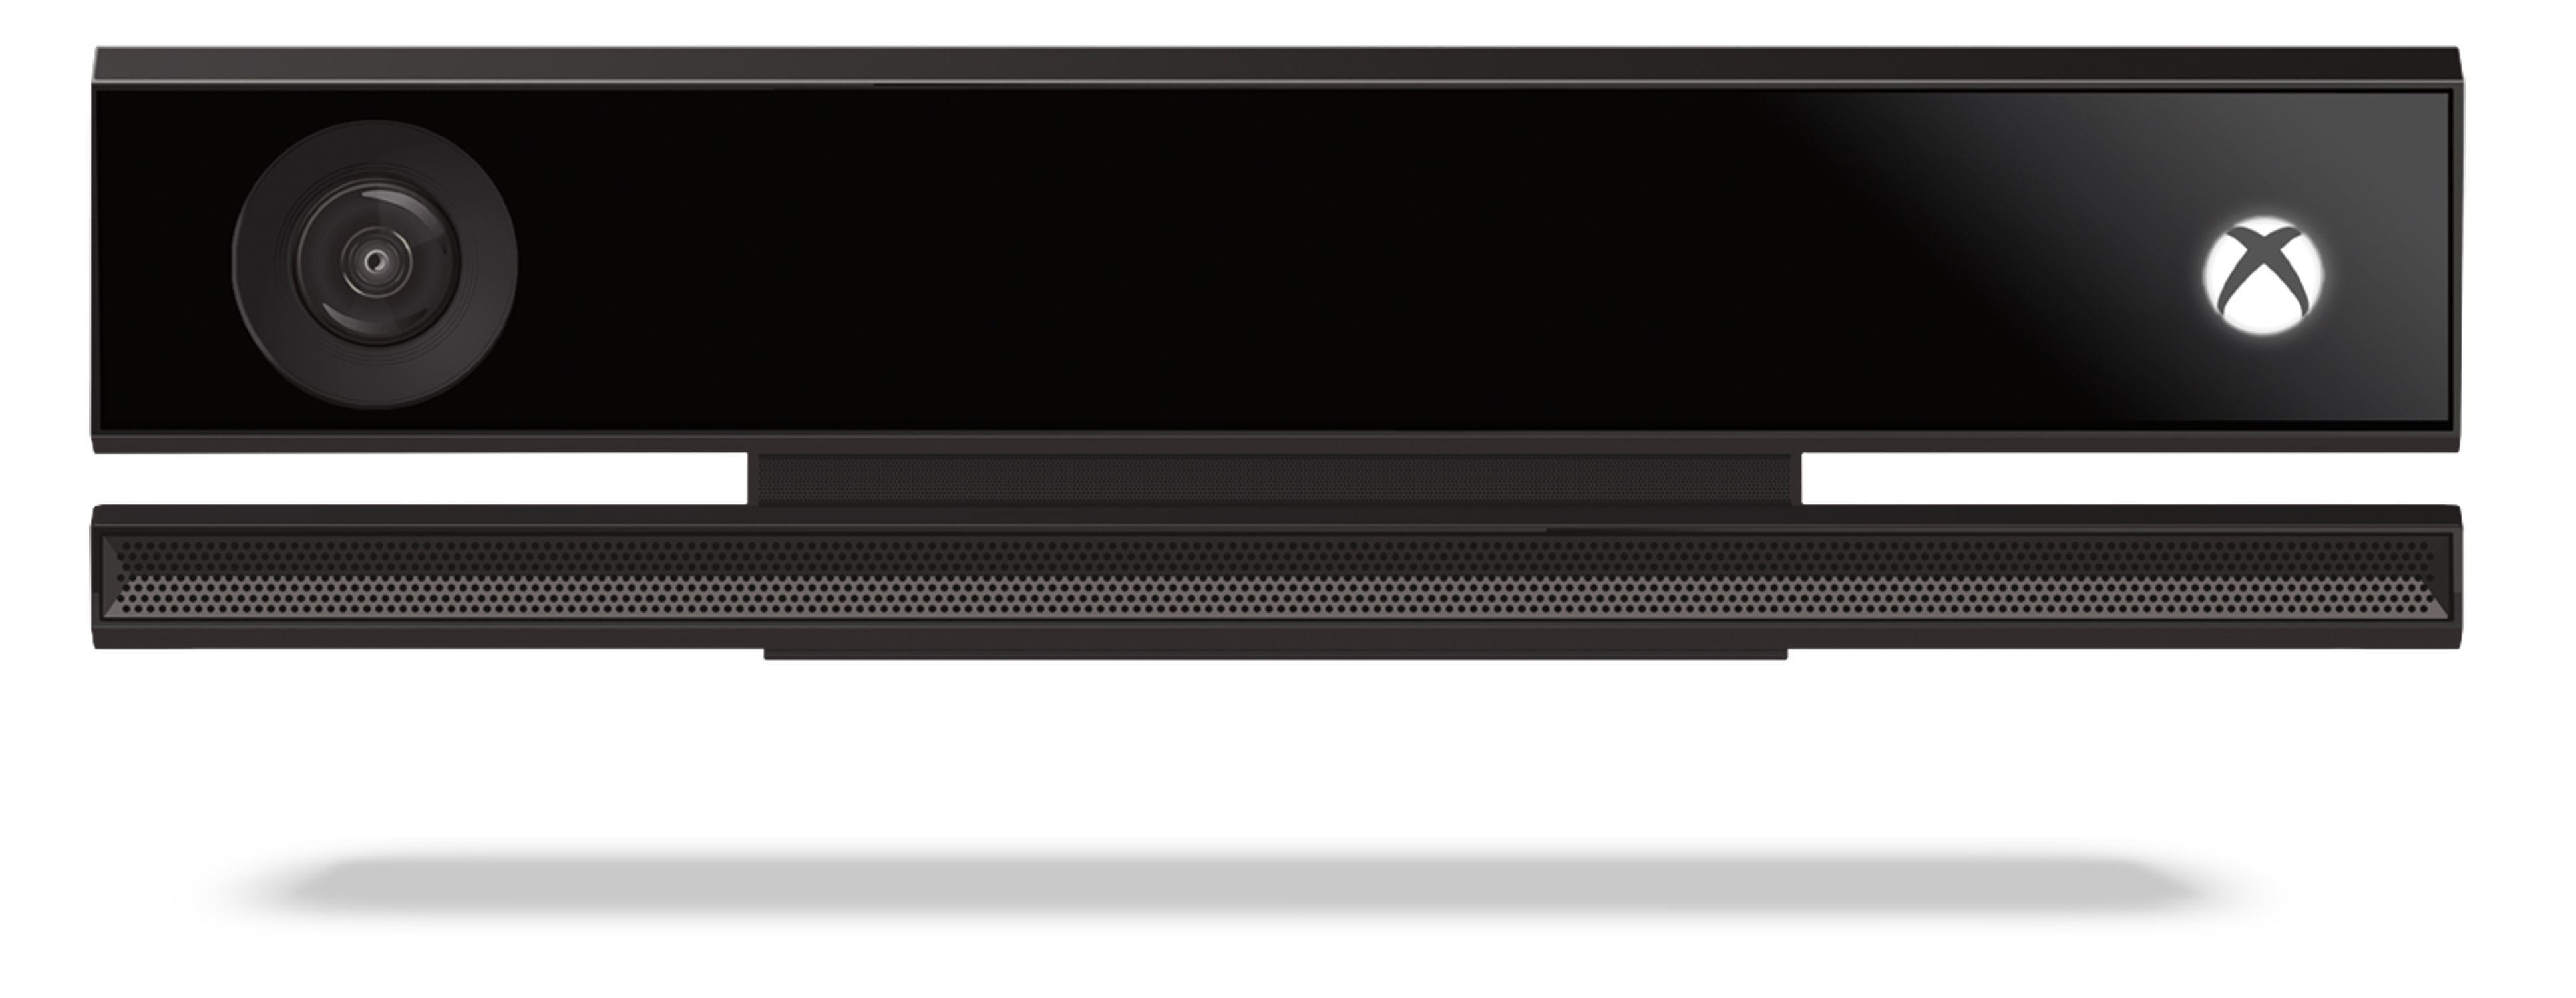 XboxOneKinect.jpg